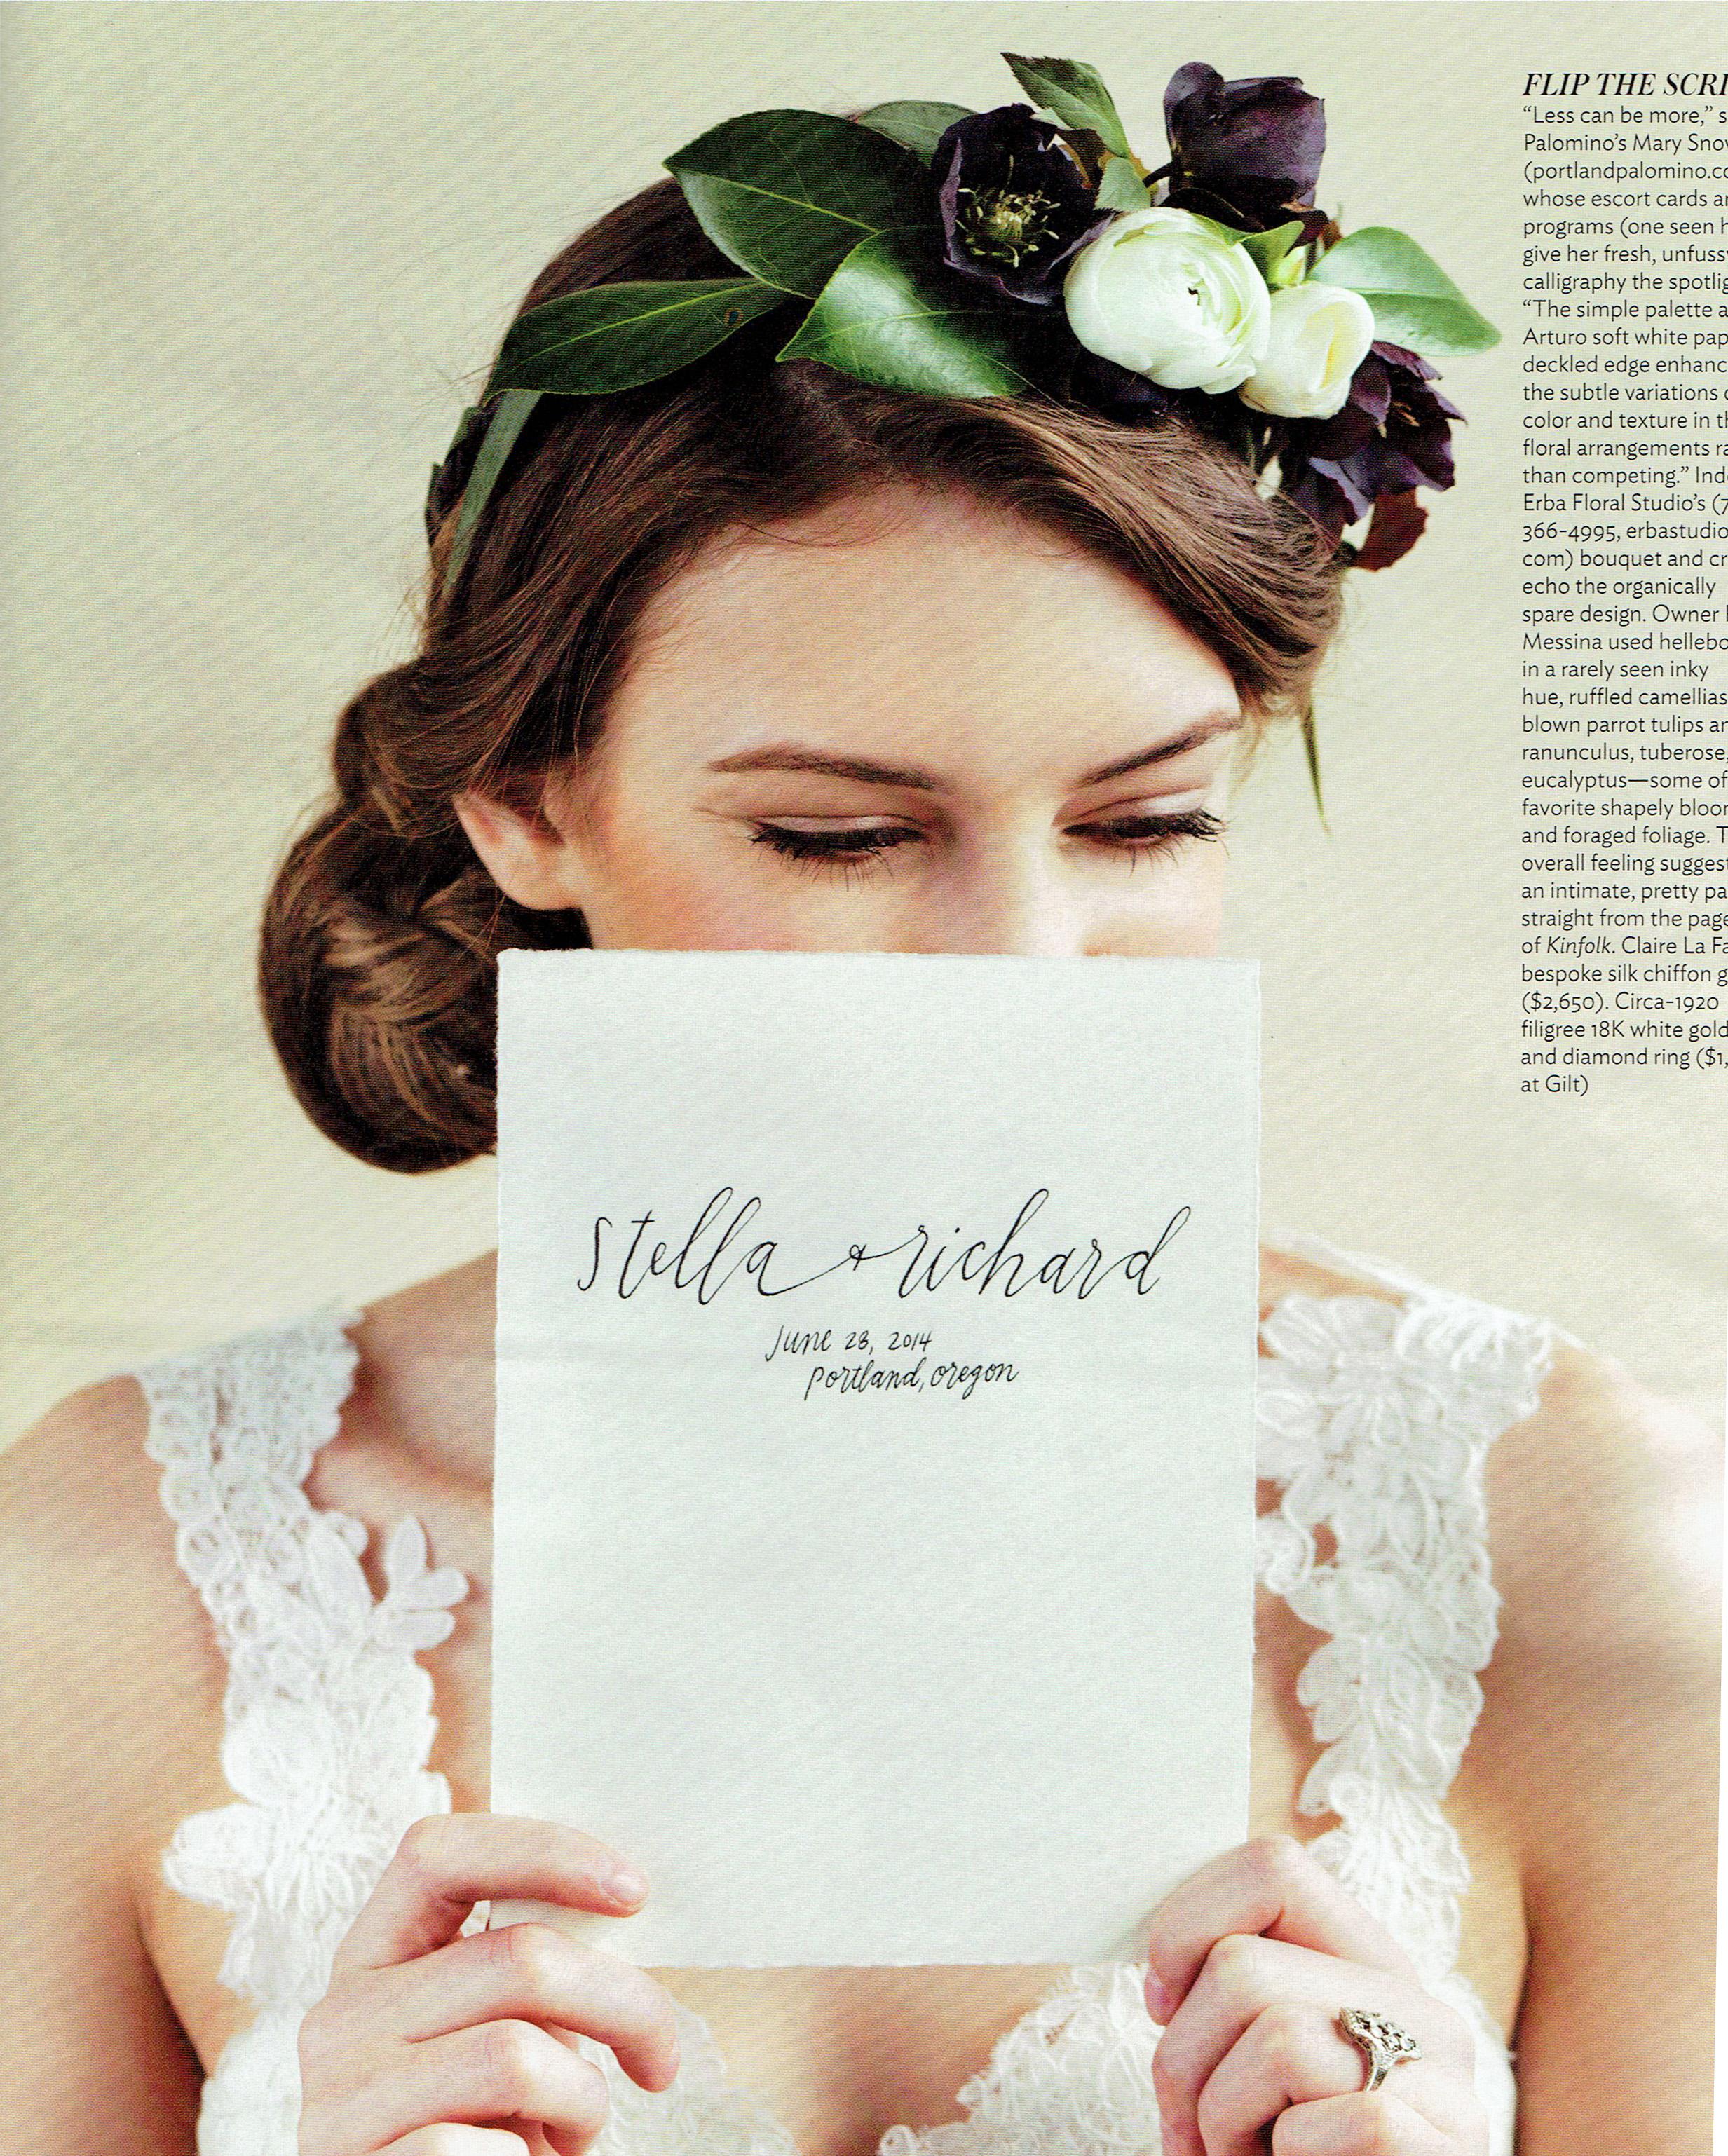 Portland Bride and Groom - Summer/Fall 2014